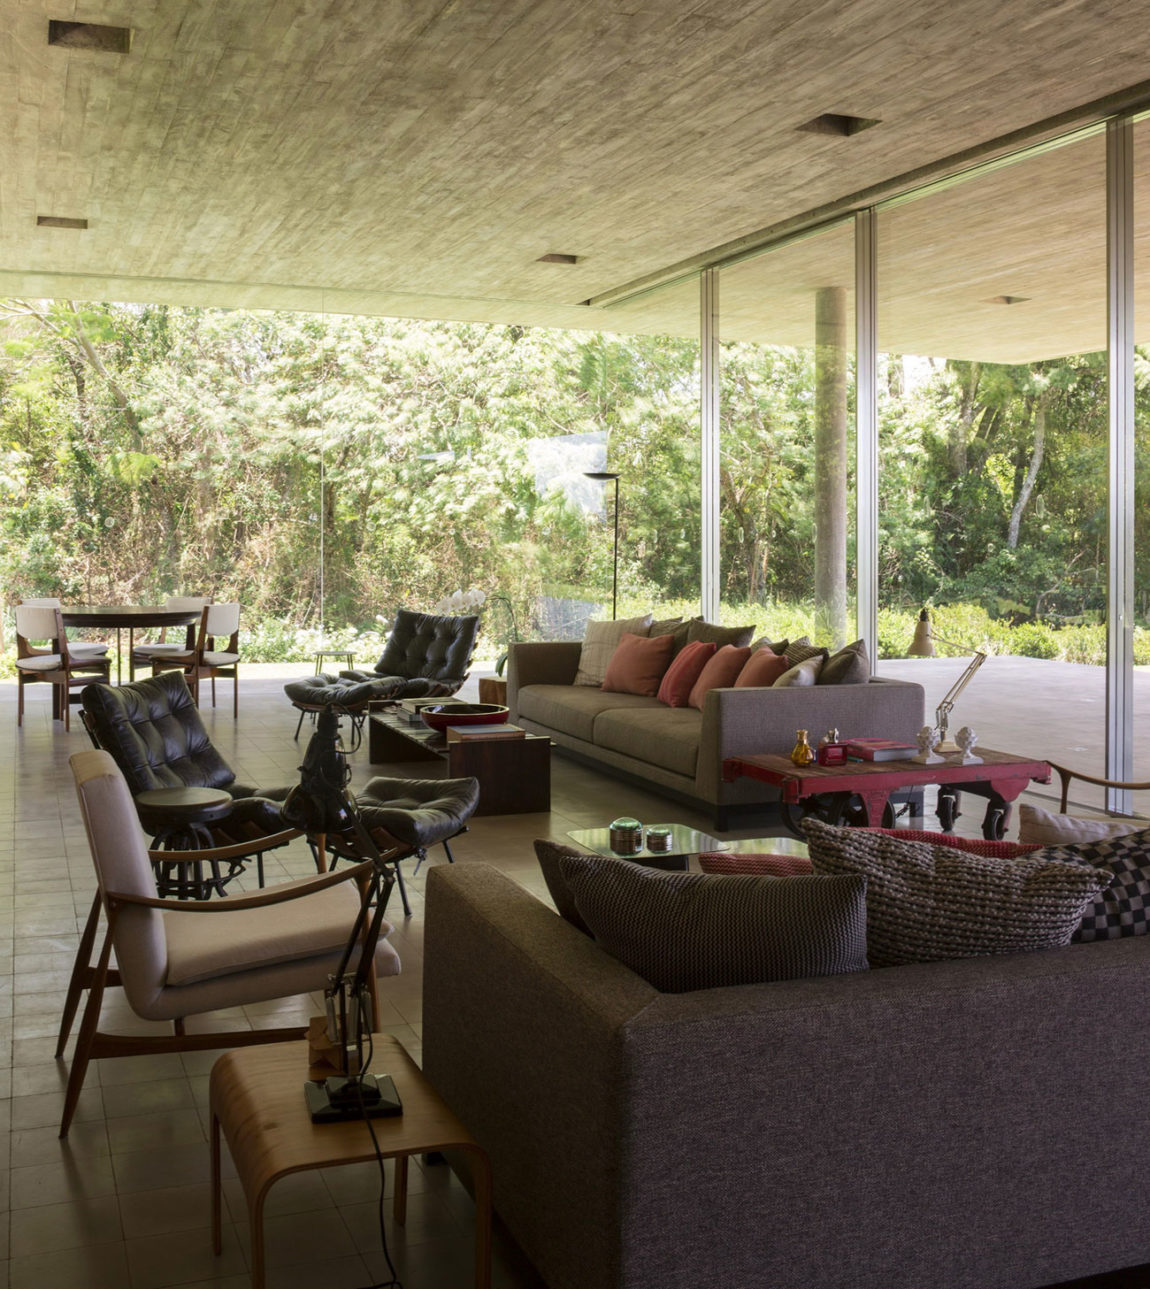 Redux House by Studio mk27 (25)